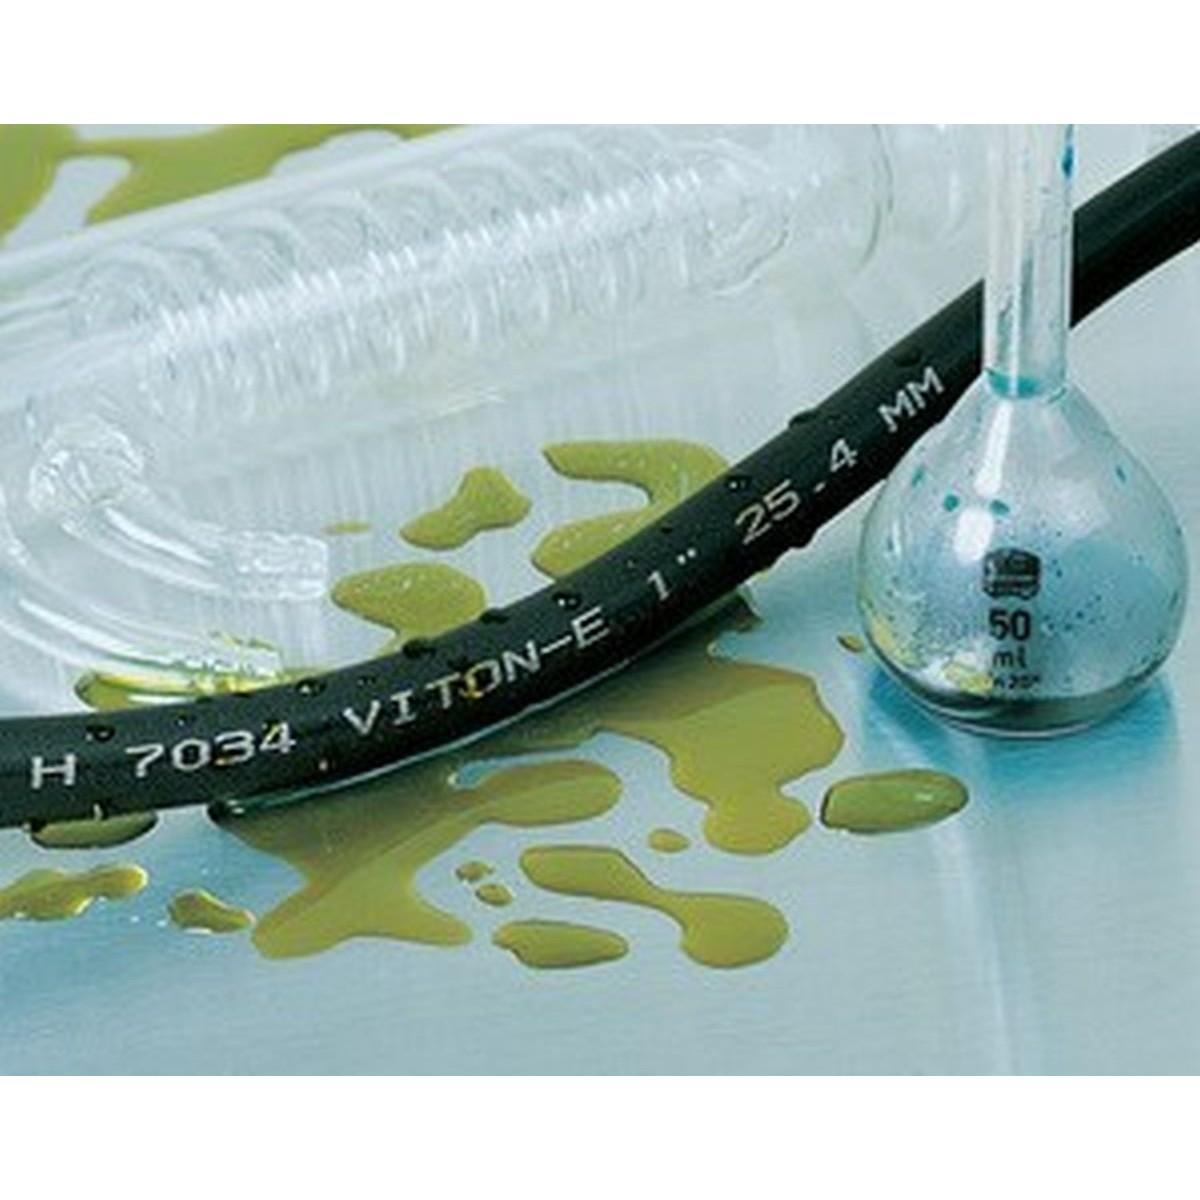 Koszulki termokurczliwe 2:1 50m VITON-E-3,2/1,6-FPMX-BK ...